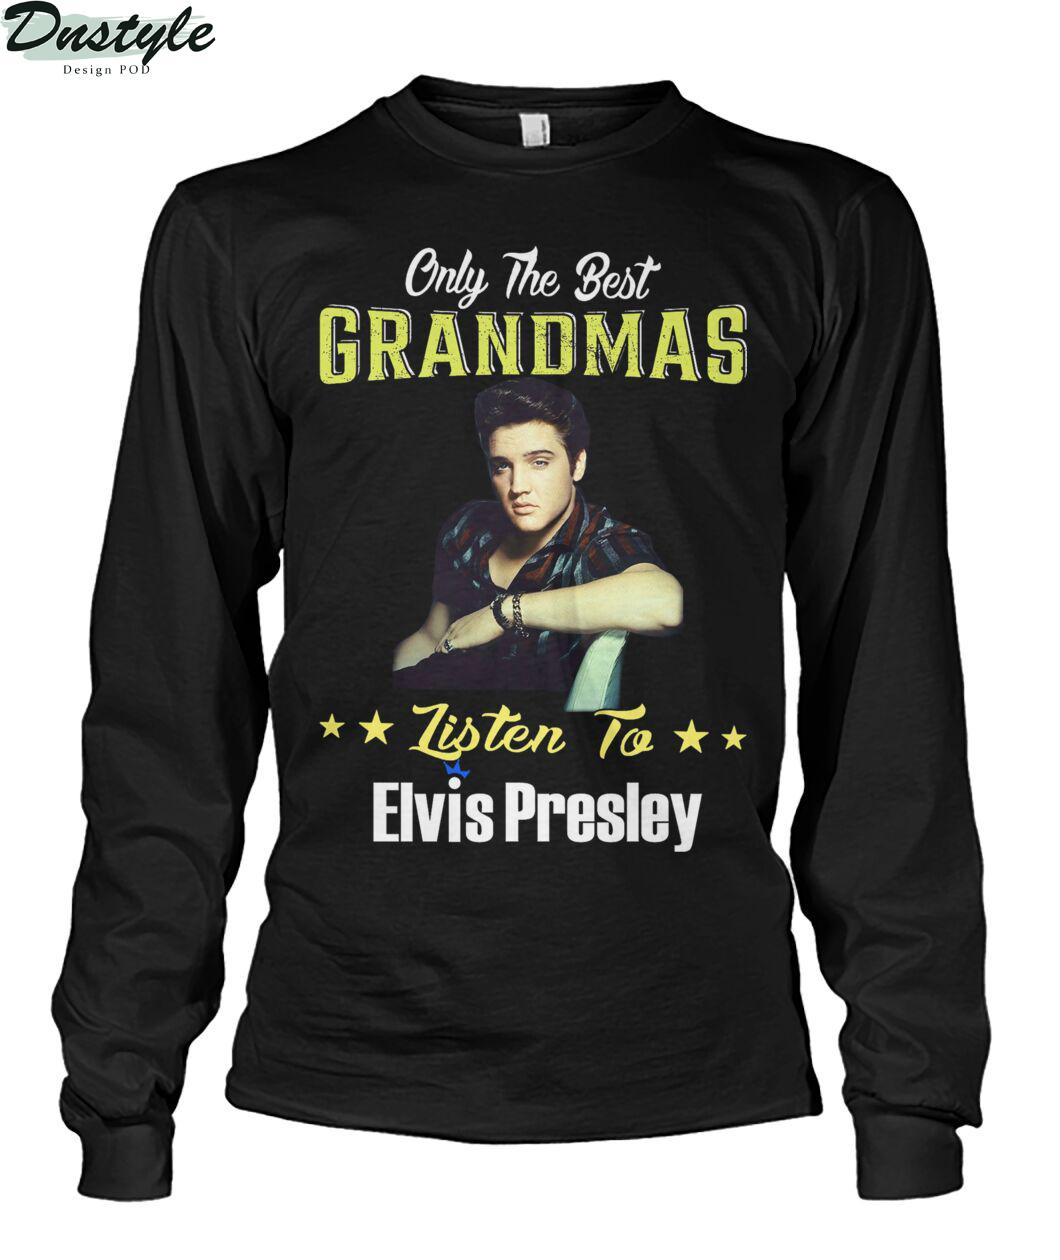 Only the best grandmas listen to elvis presley long sleeve